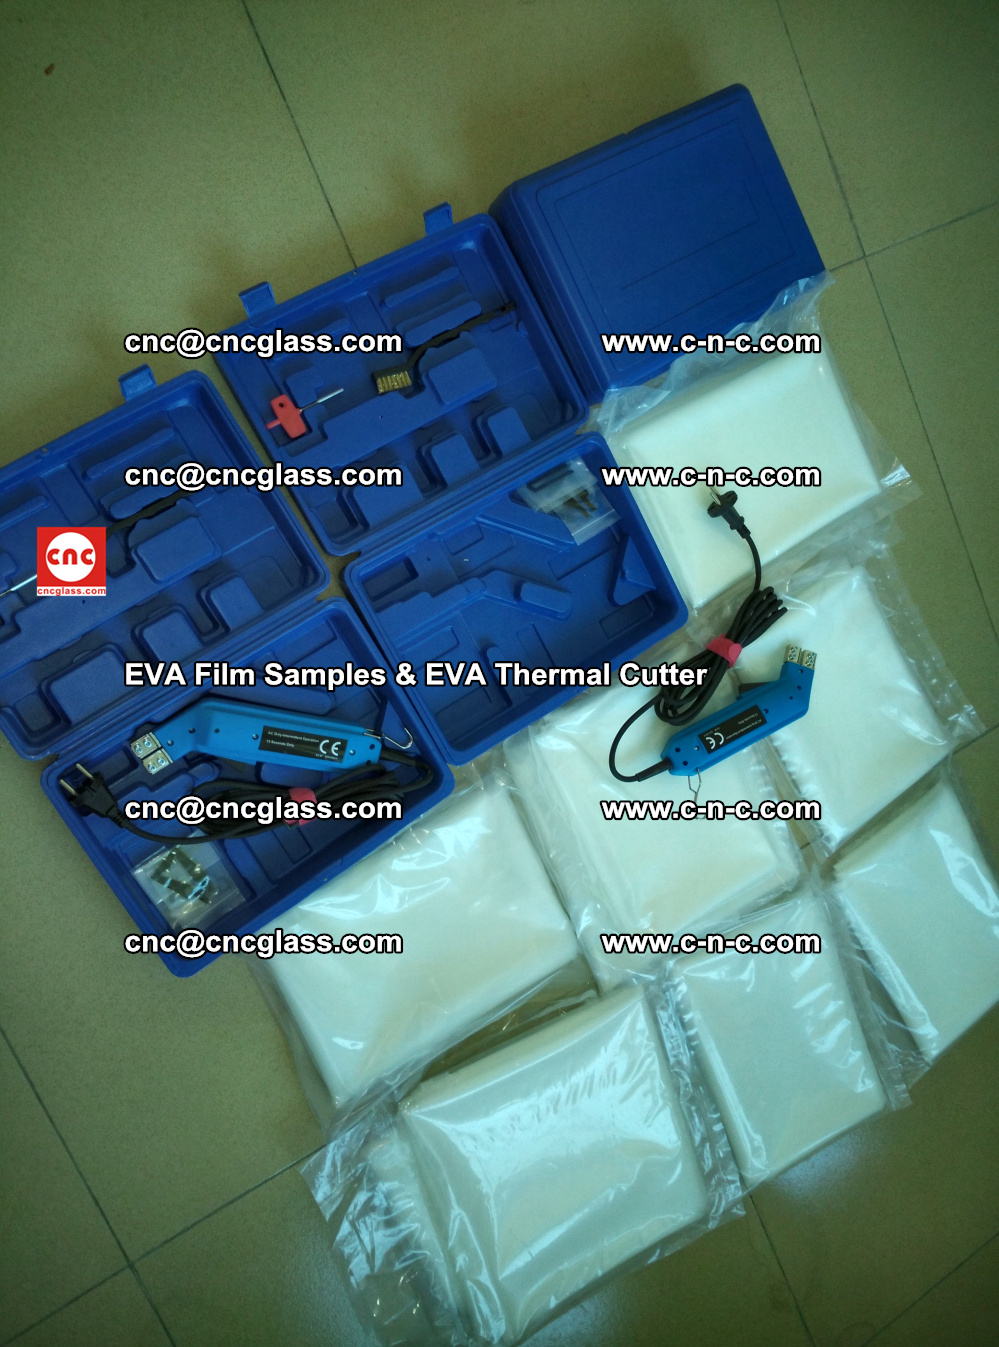 EVAFORCE SUPER CLEAR EVA Film Samples and EVA Thermal Cutter (15)